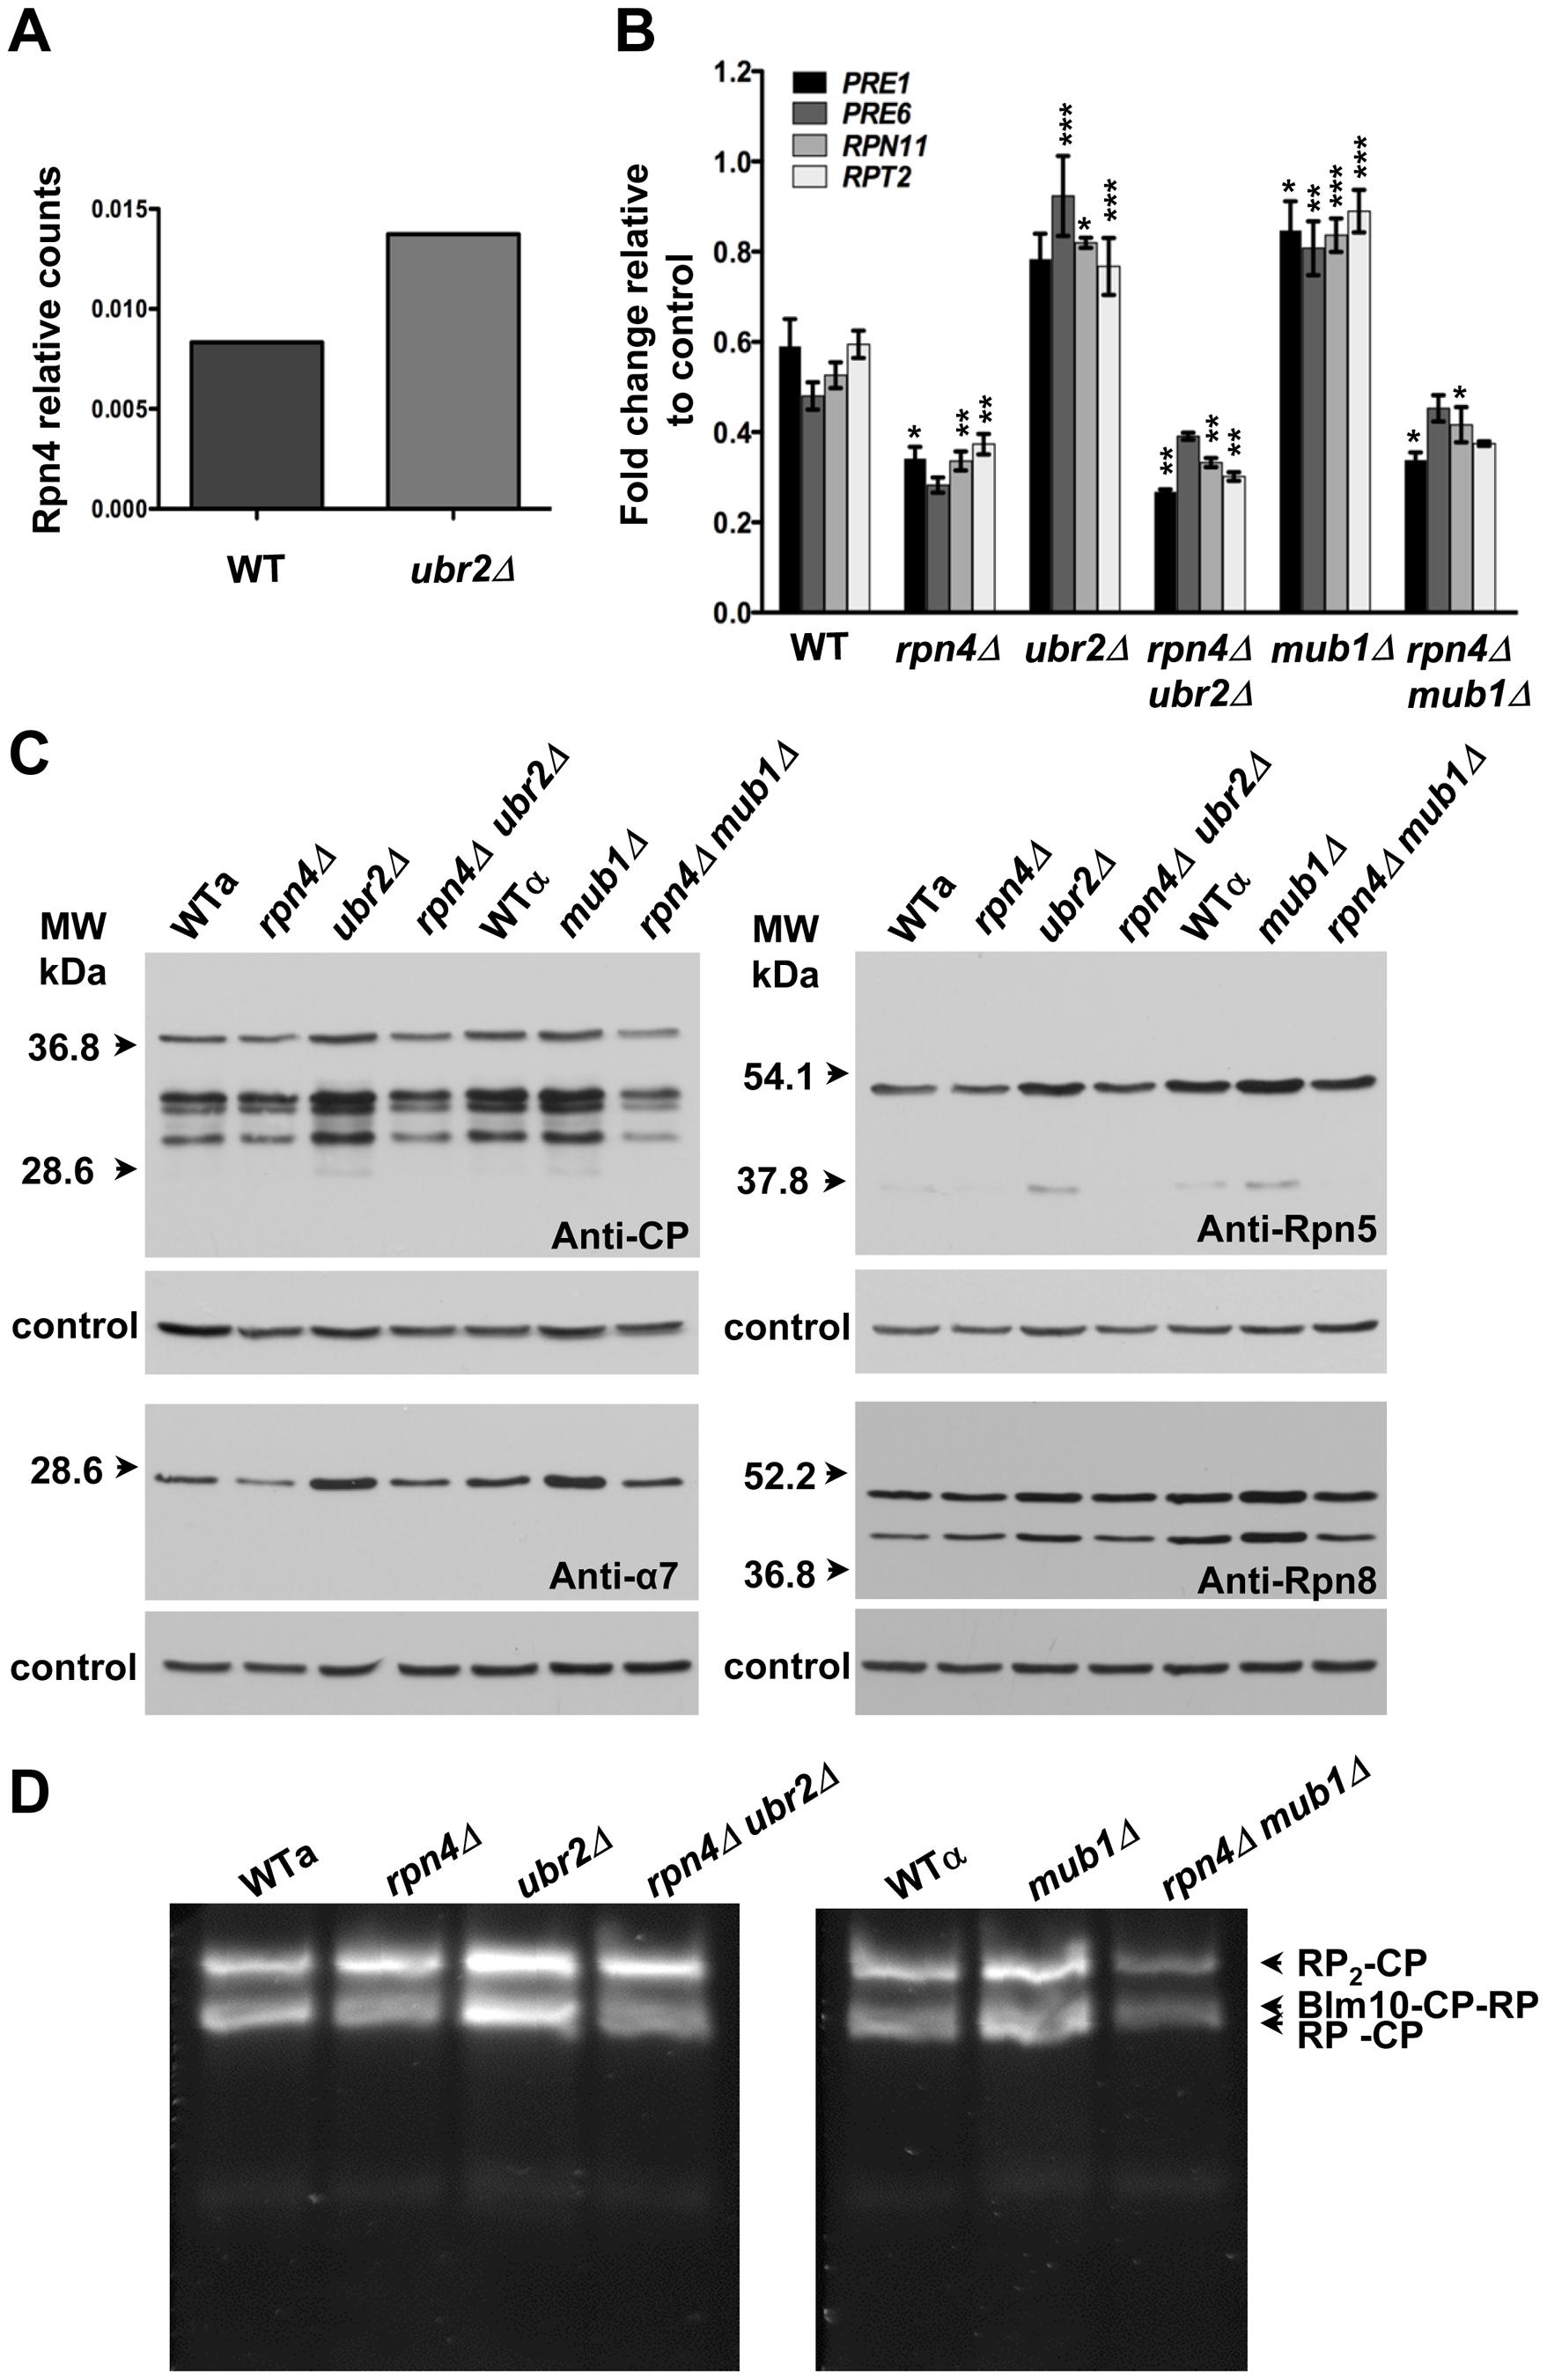 Extended proteasome biogenesis and subunit abundance upon loss of <i>UBR2</i> or <i>MUB1.</i>